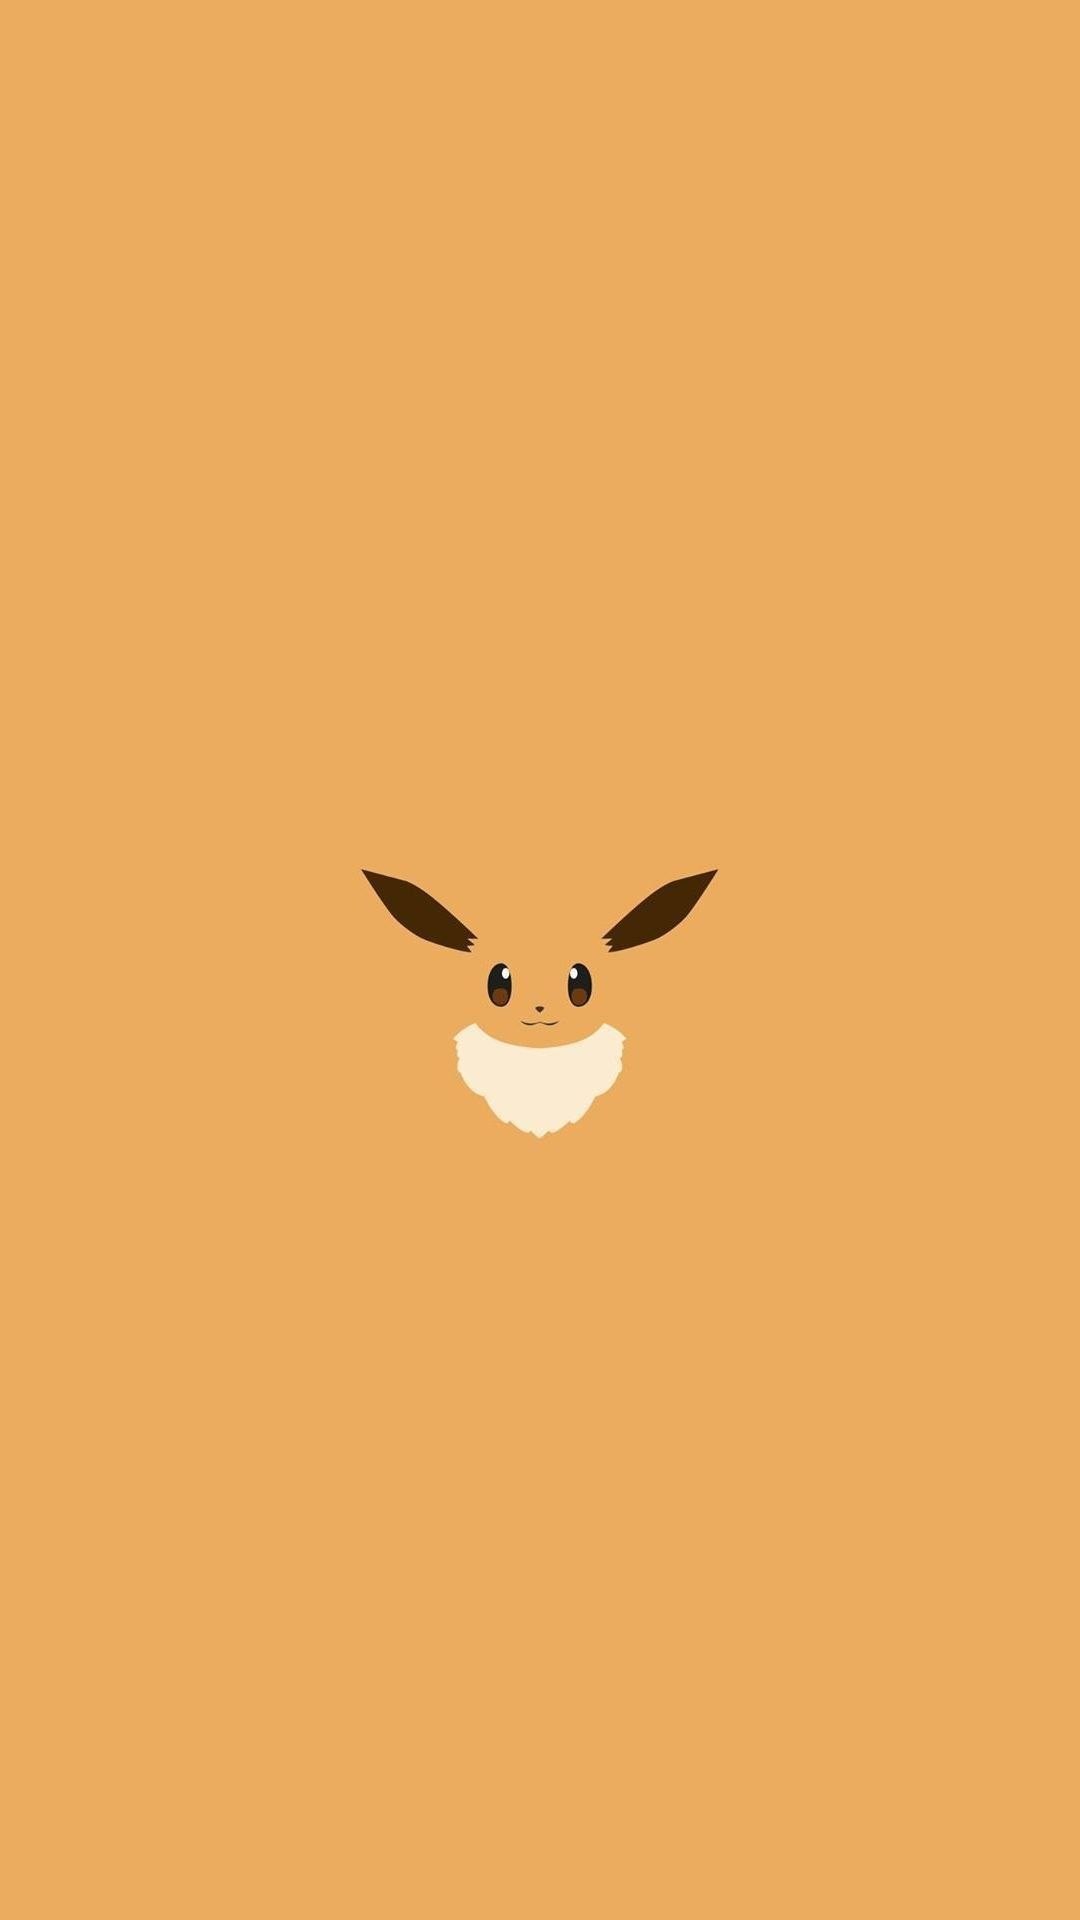 Pokemon Minimalist iPhone 6 wallpaper hd